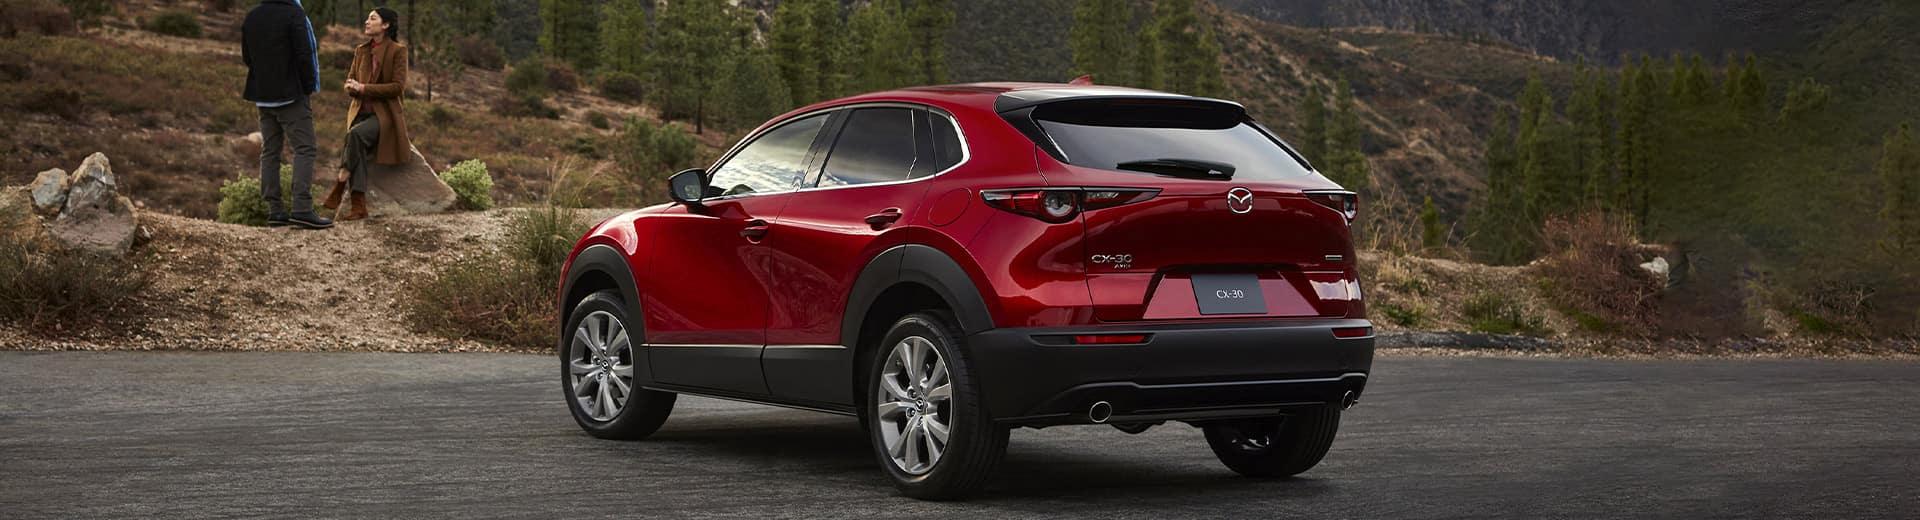 Mazda CX-30 - Exterior Ciew with i-Activ AWD